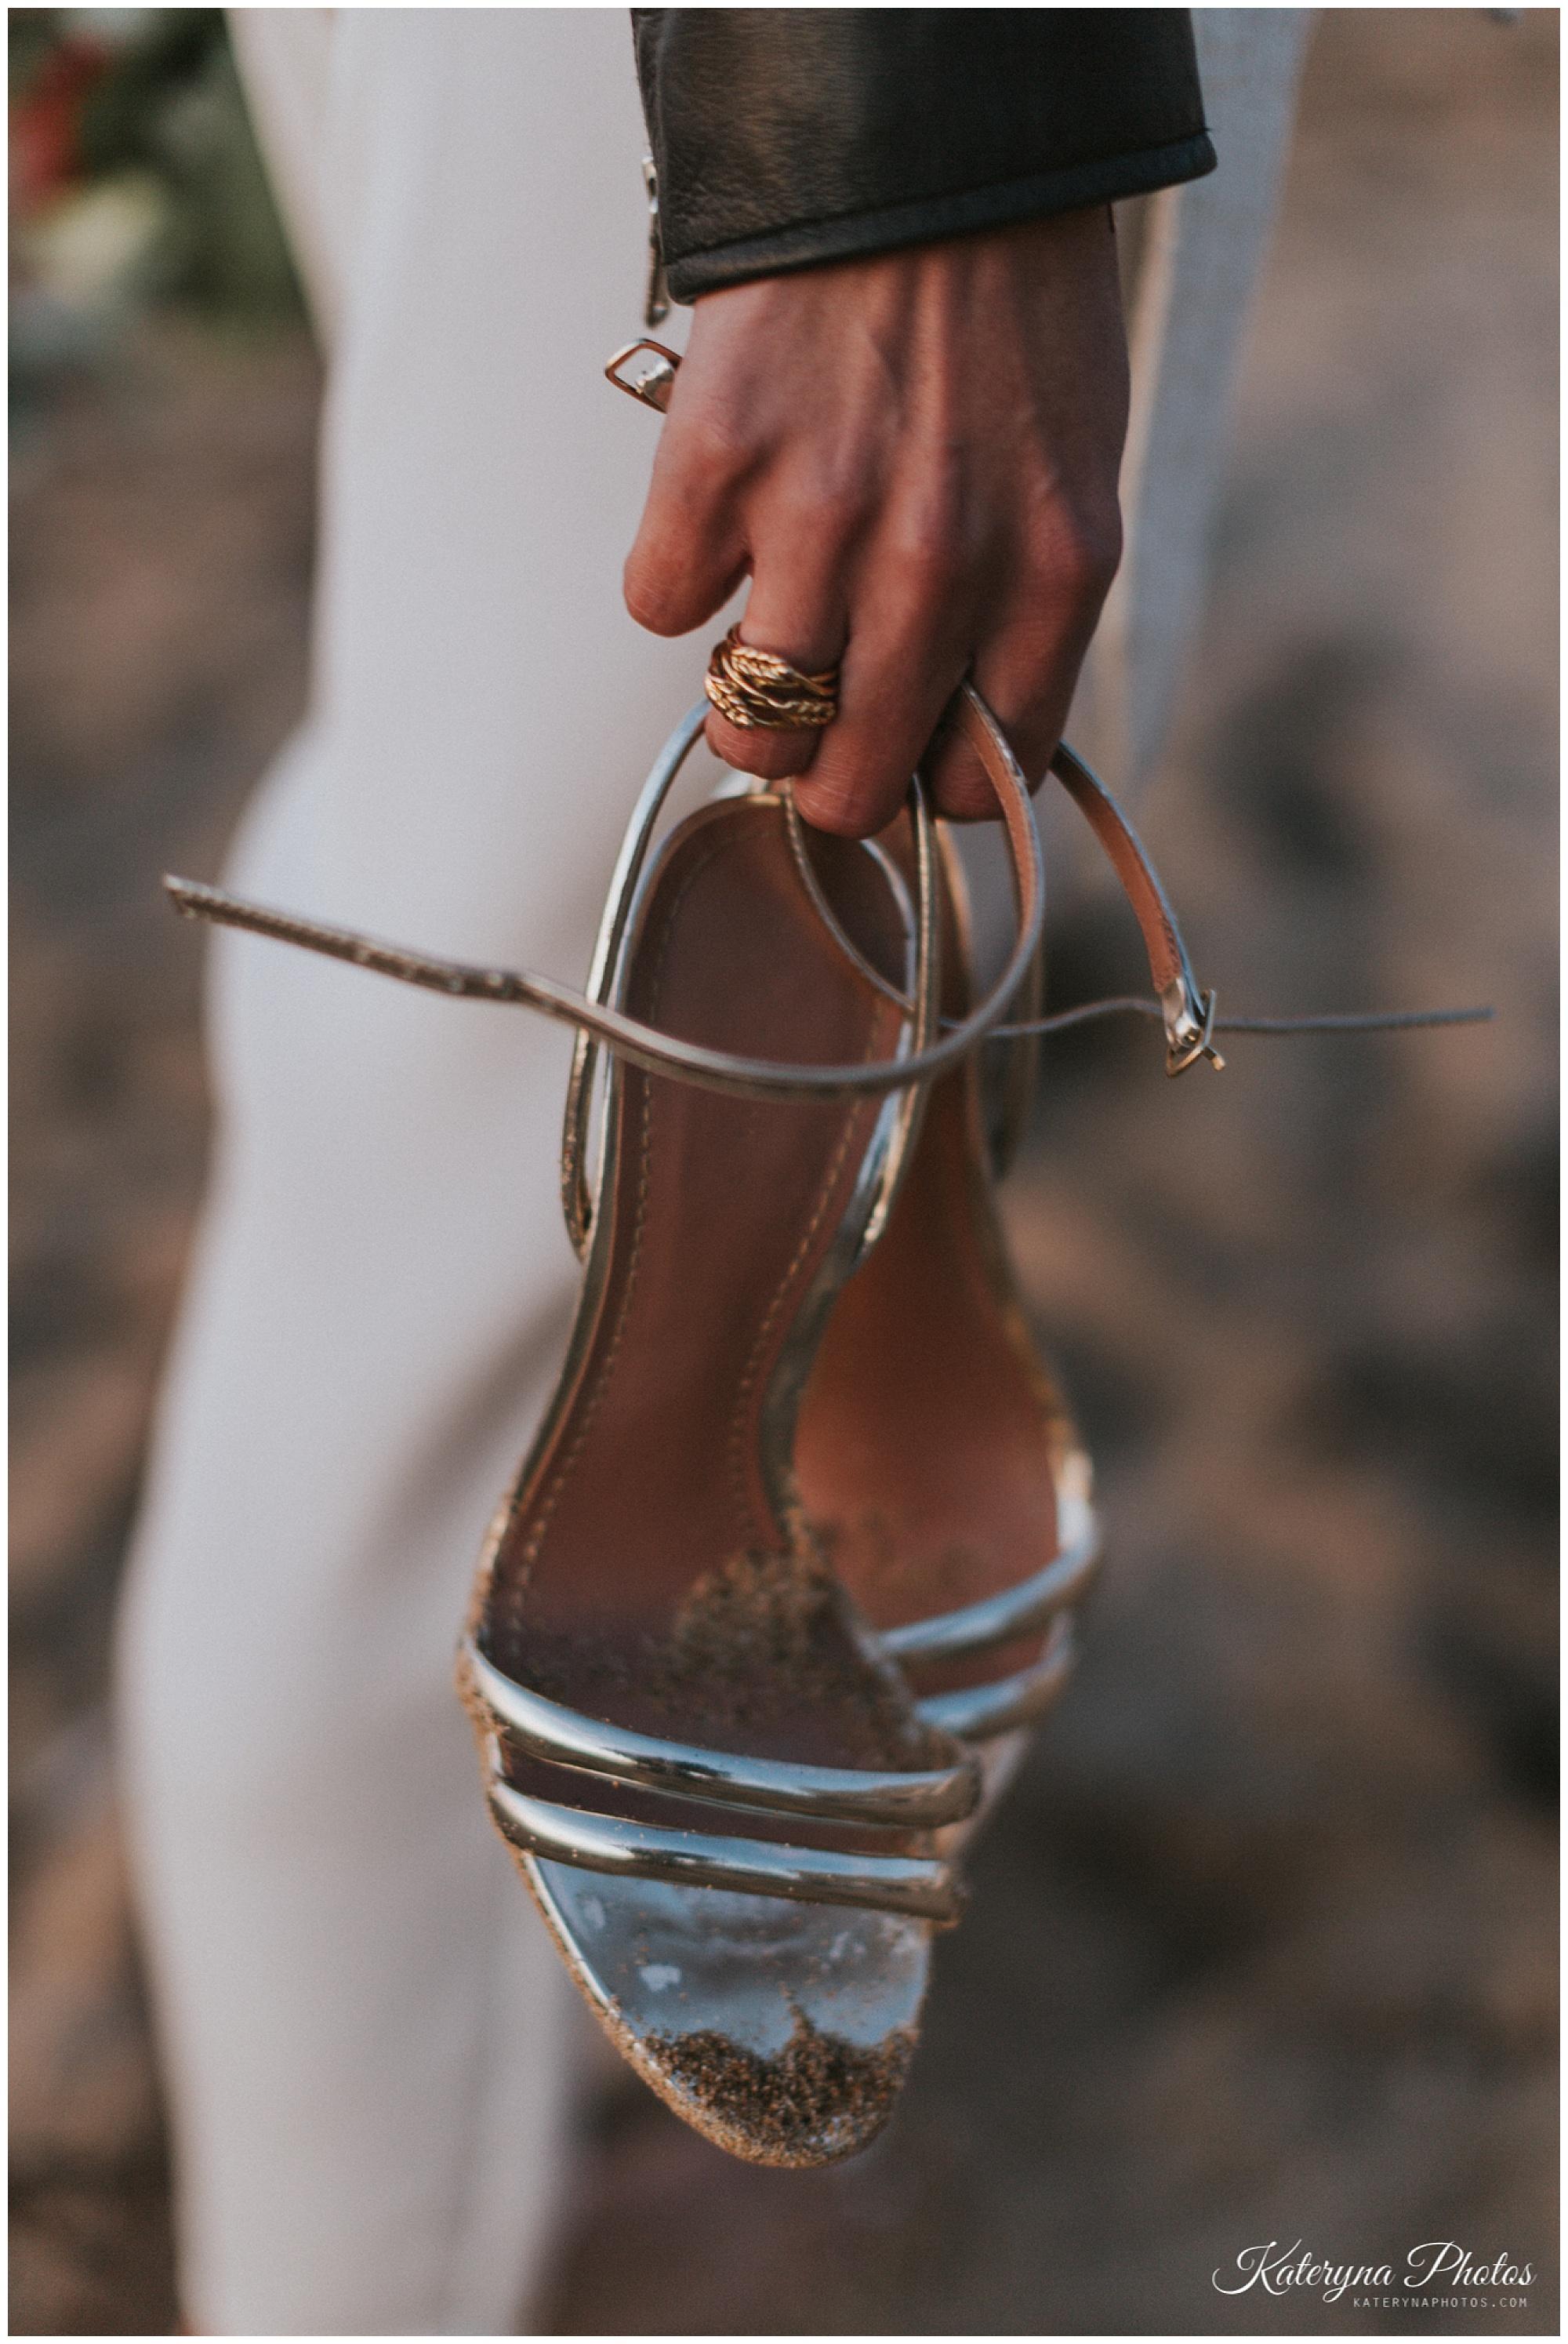 Kateryna-photos-photographe-mariage-bretagne-saint-malo-finistere-cotes-darmor-wedding_0101.jpg